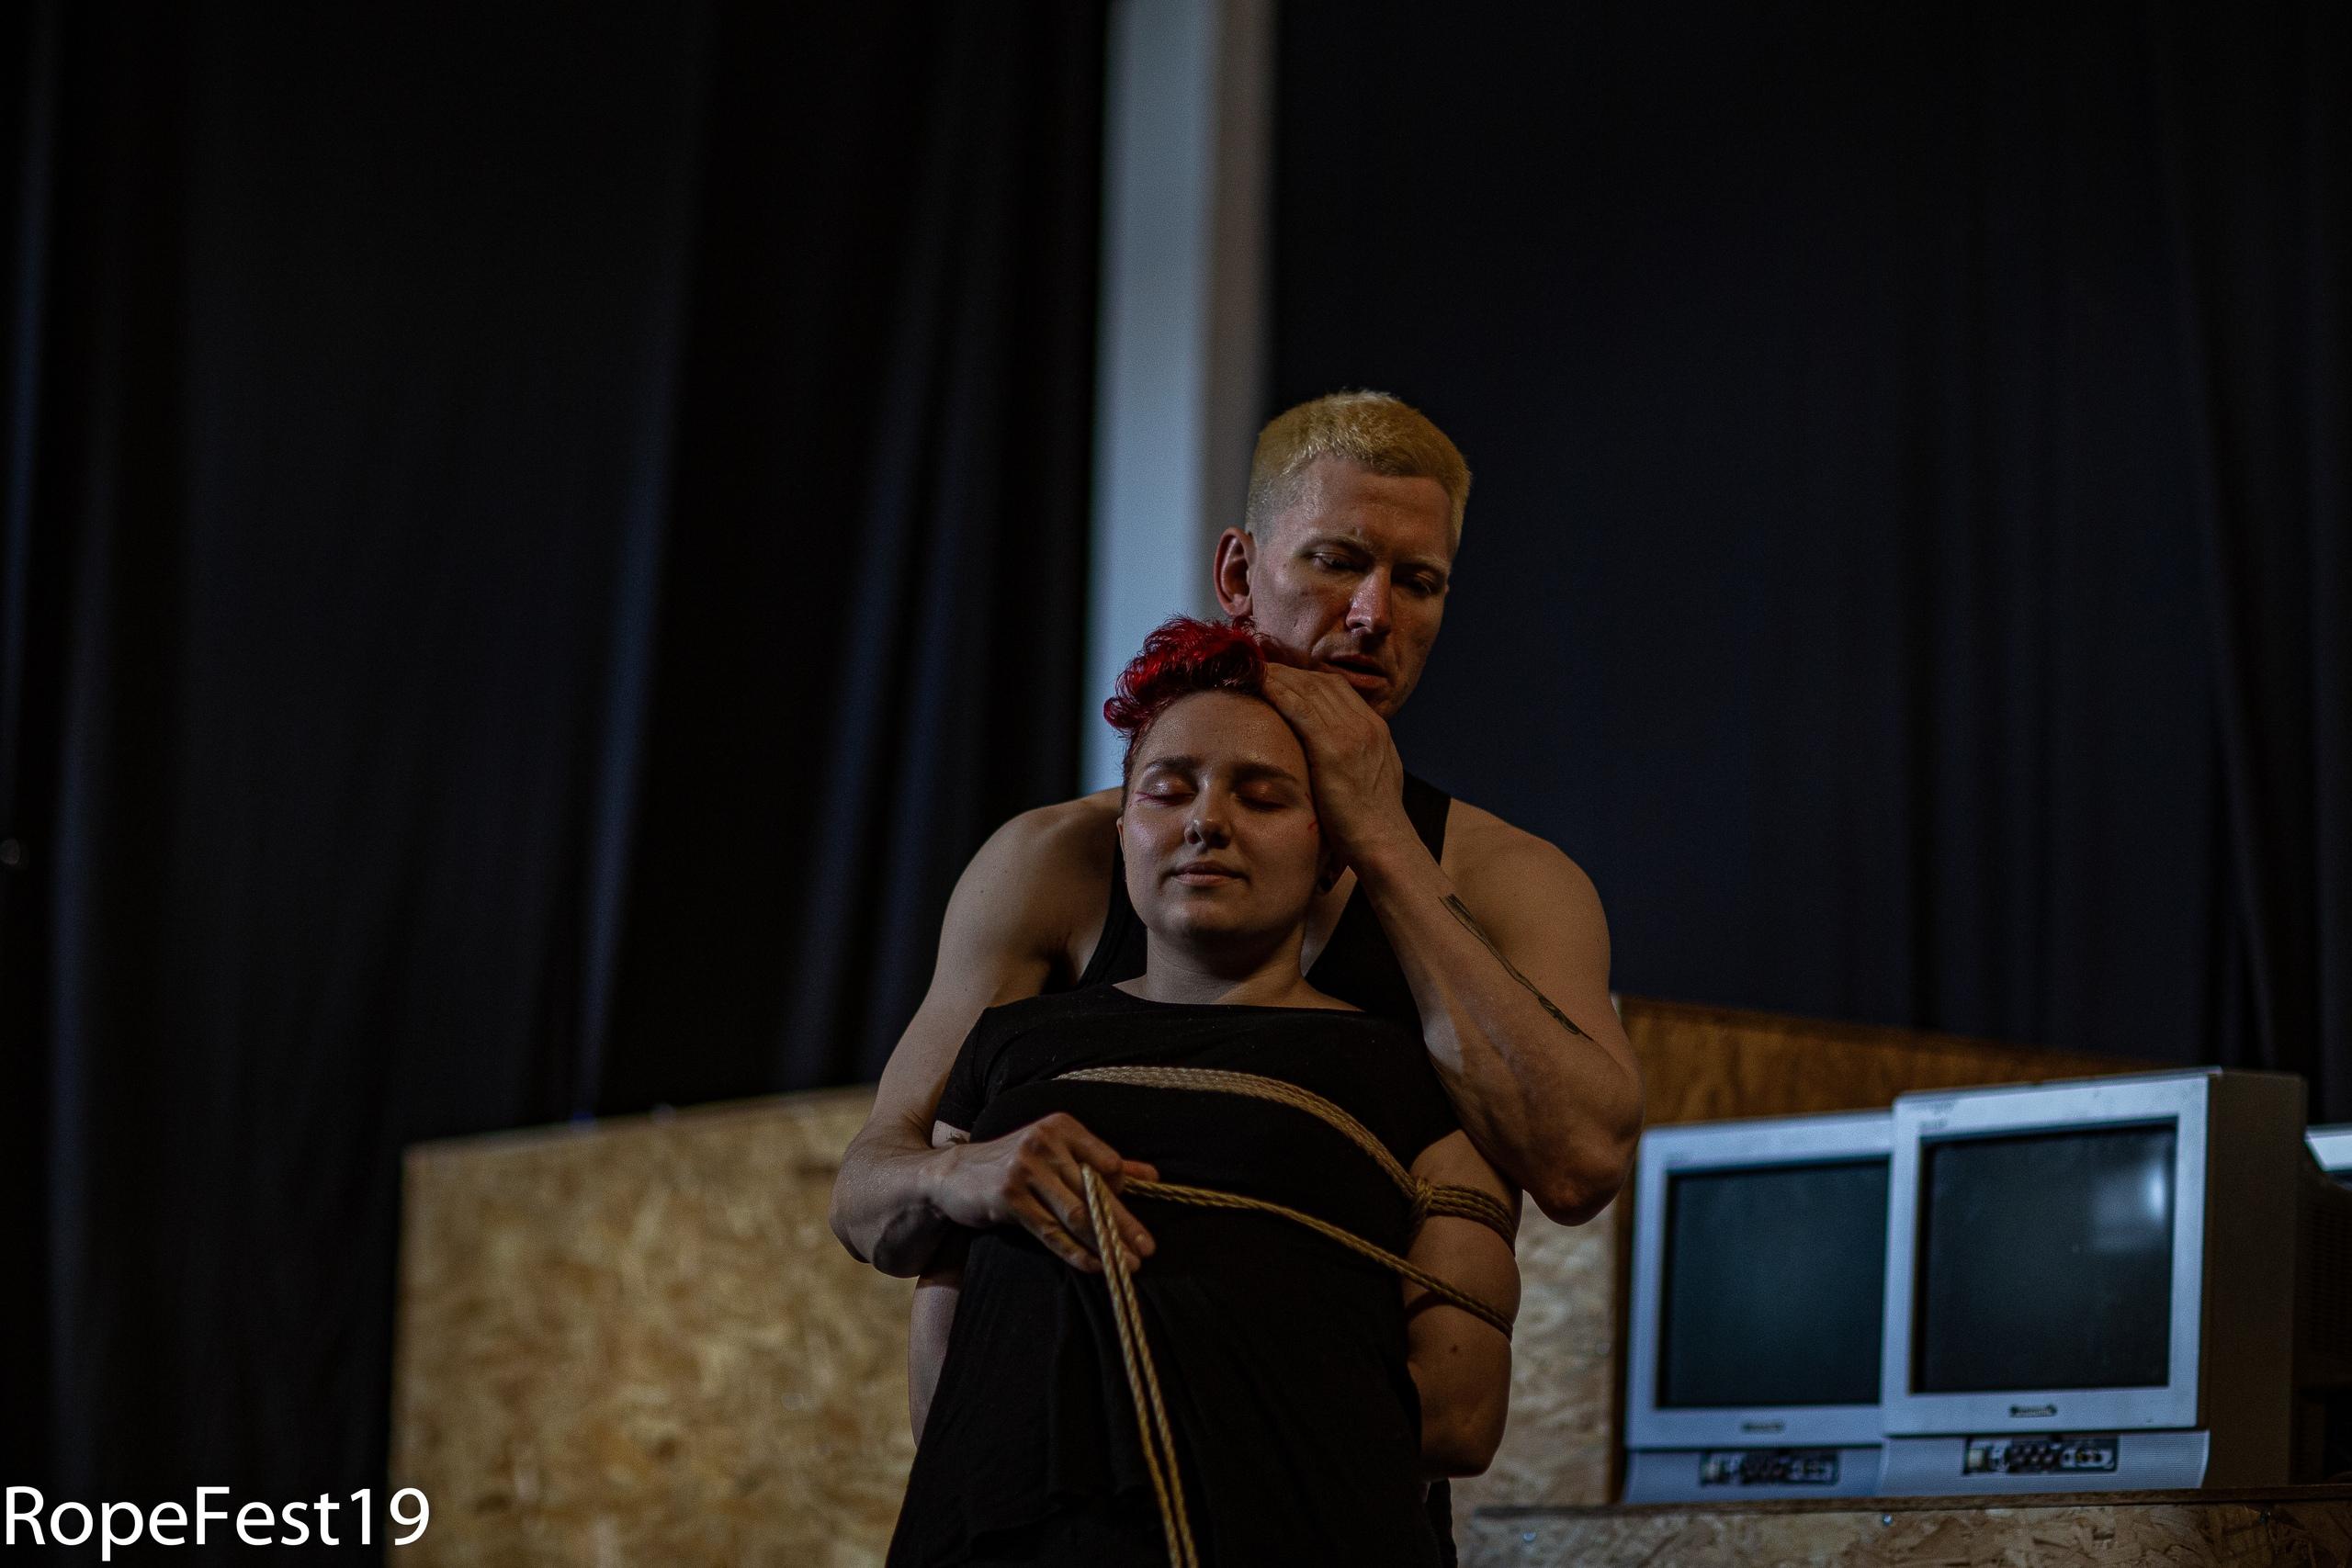 Rope Fest Peterburg 2019. Bondage: Kalahari. Foto by Faya Man